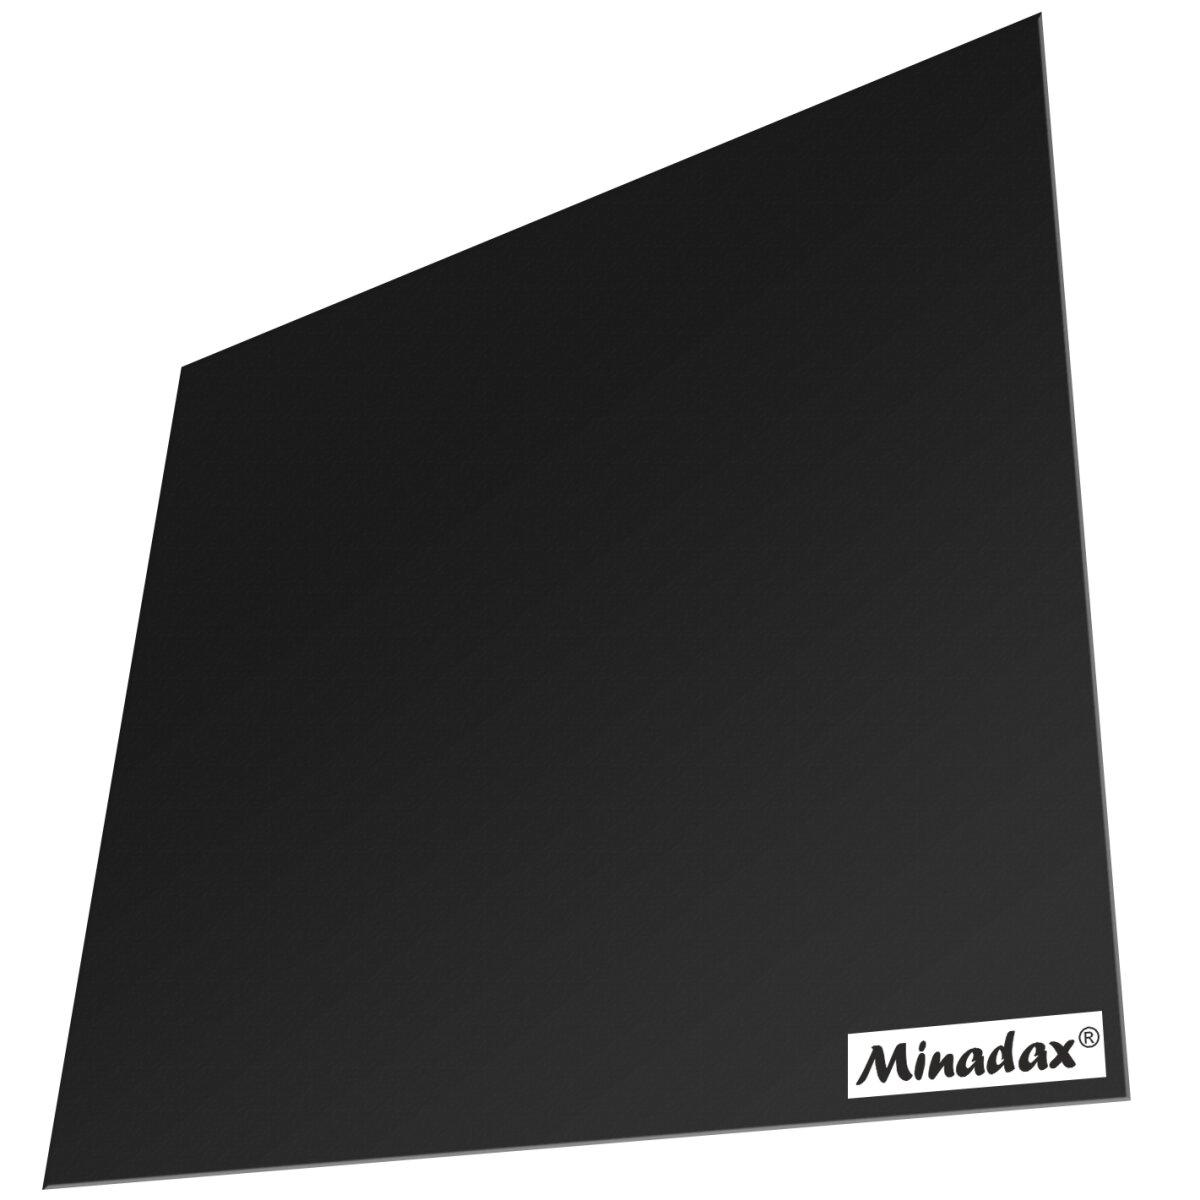 Minadax PEI 3D Druckoberfläche Schwarz 200x200mm 1mm